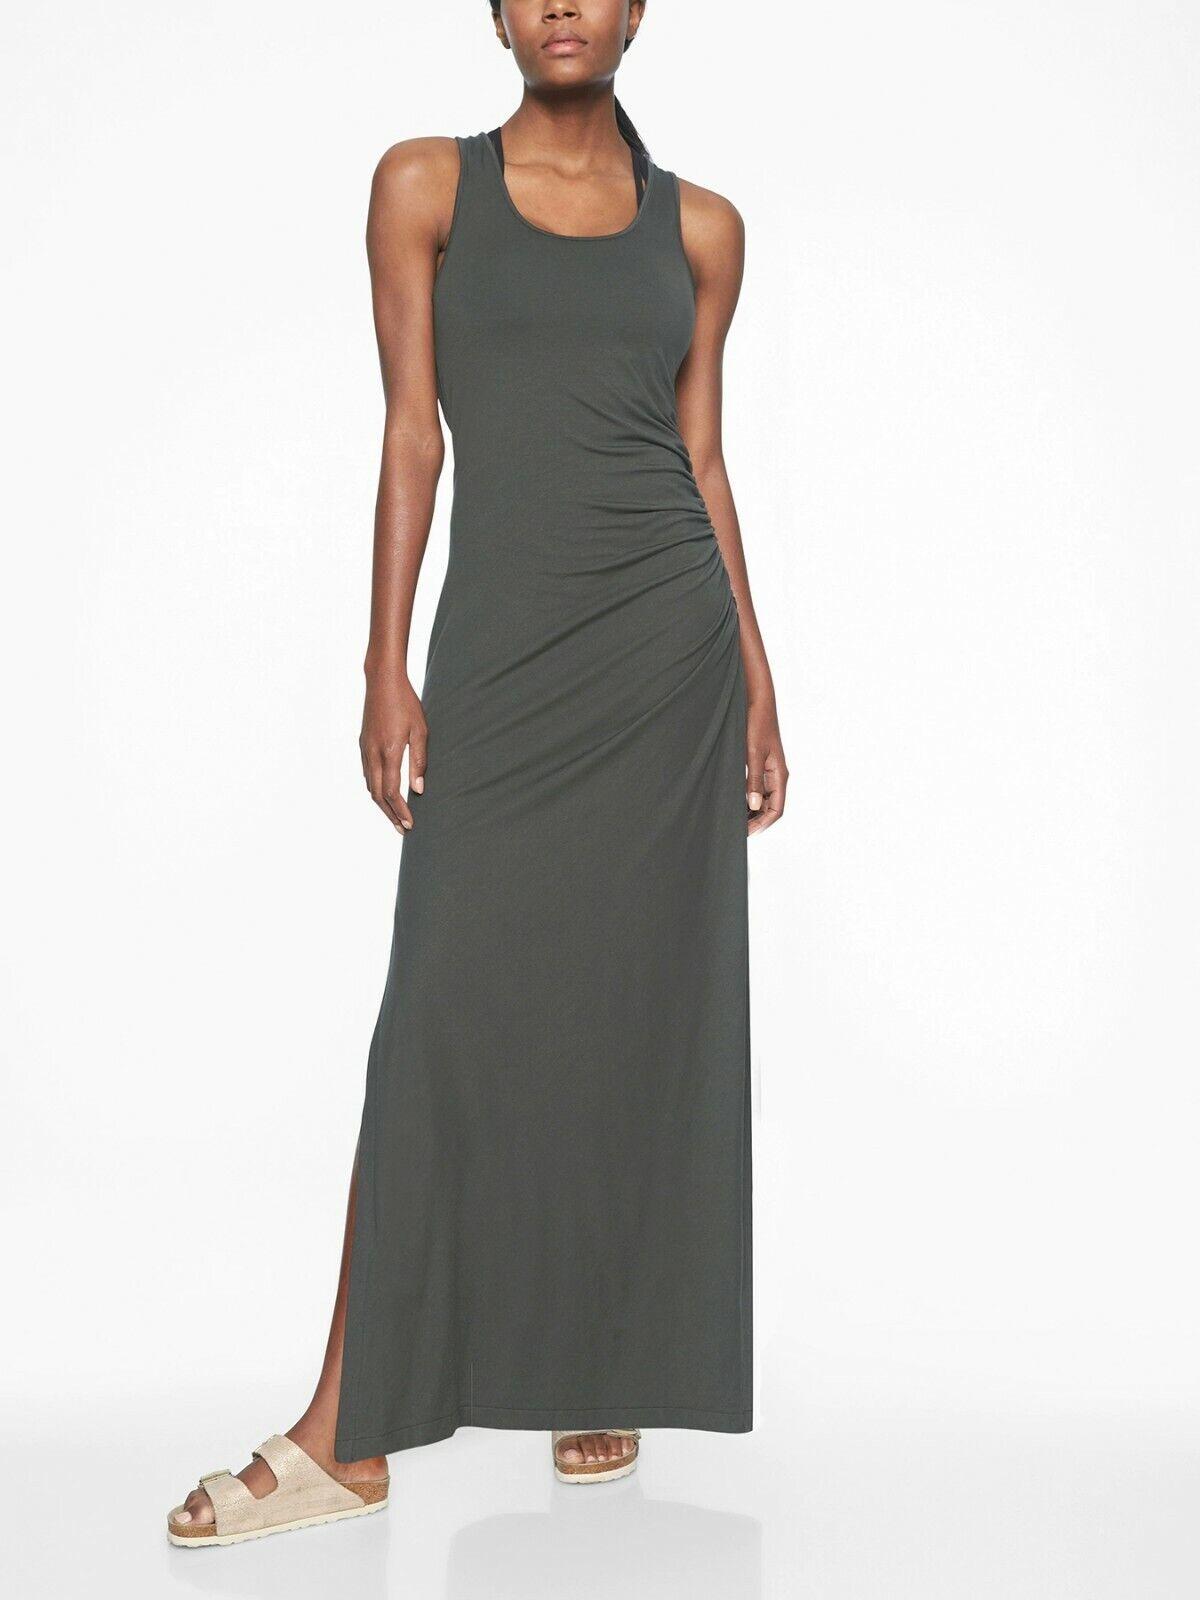 NWT Athleta Playa Maxi Dress, schwarz Olive Größe MP M P                o19